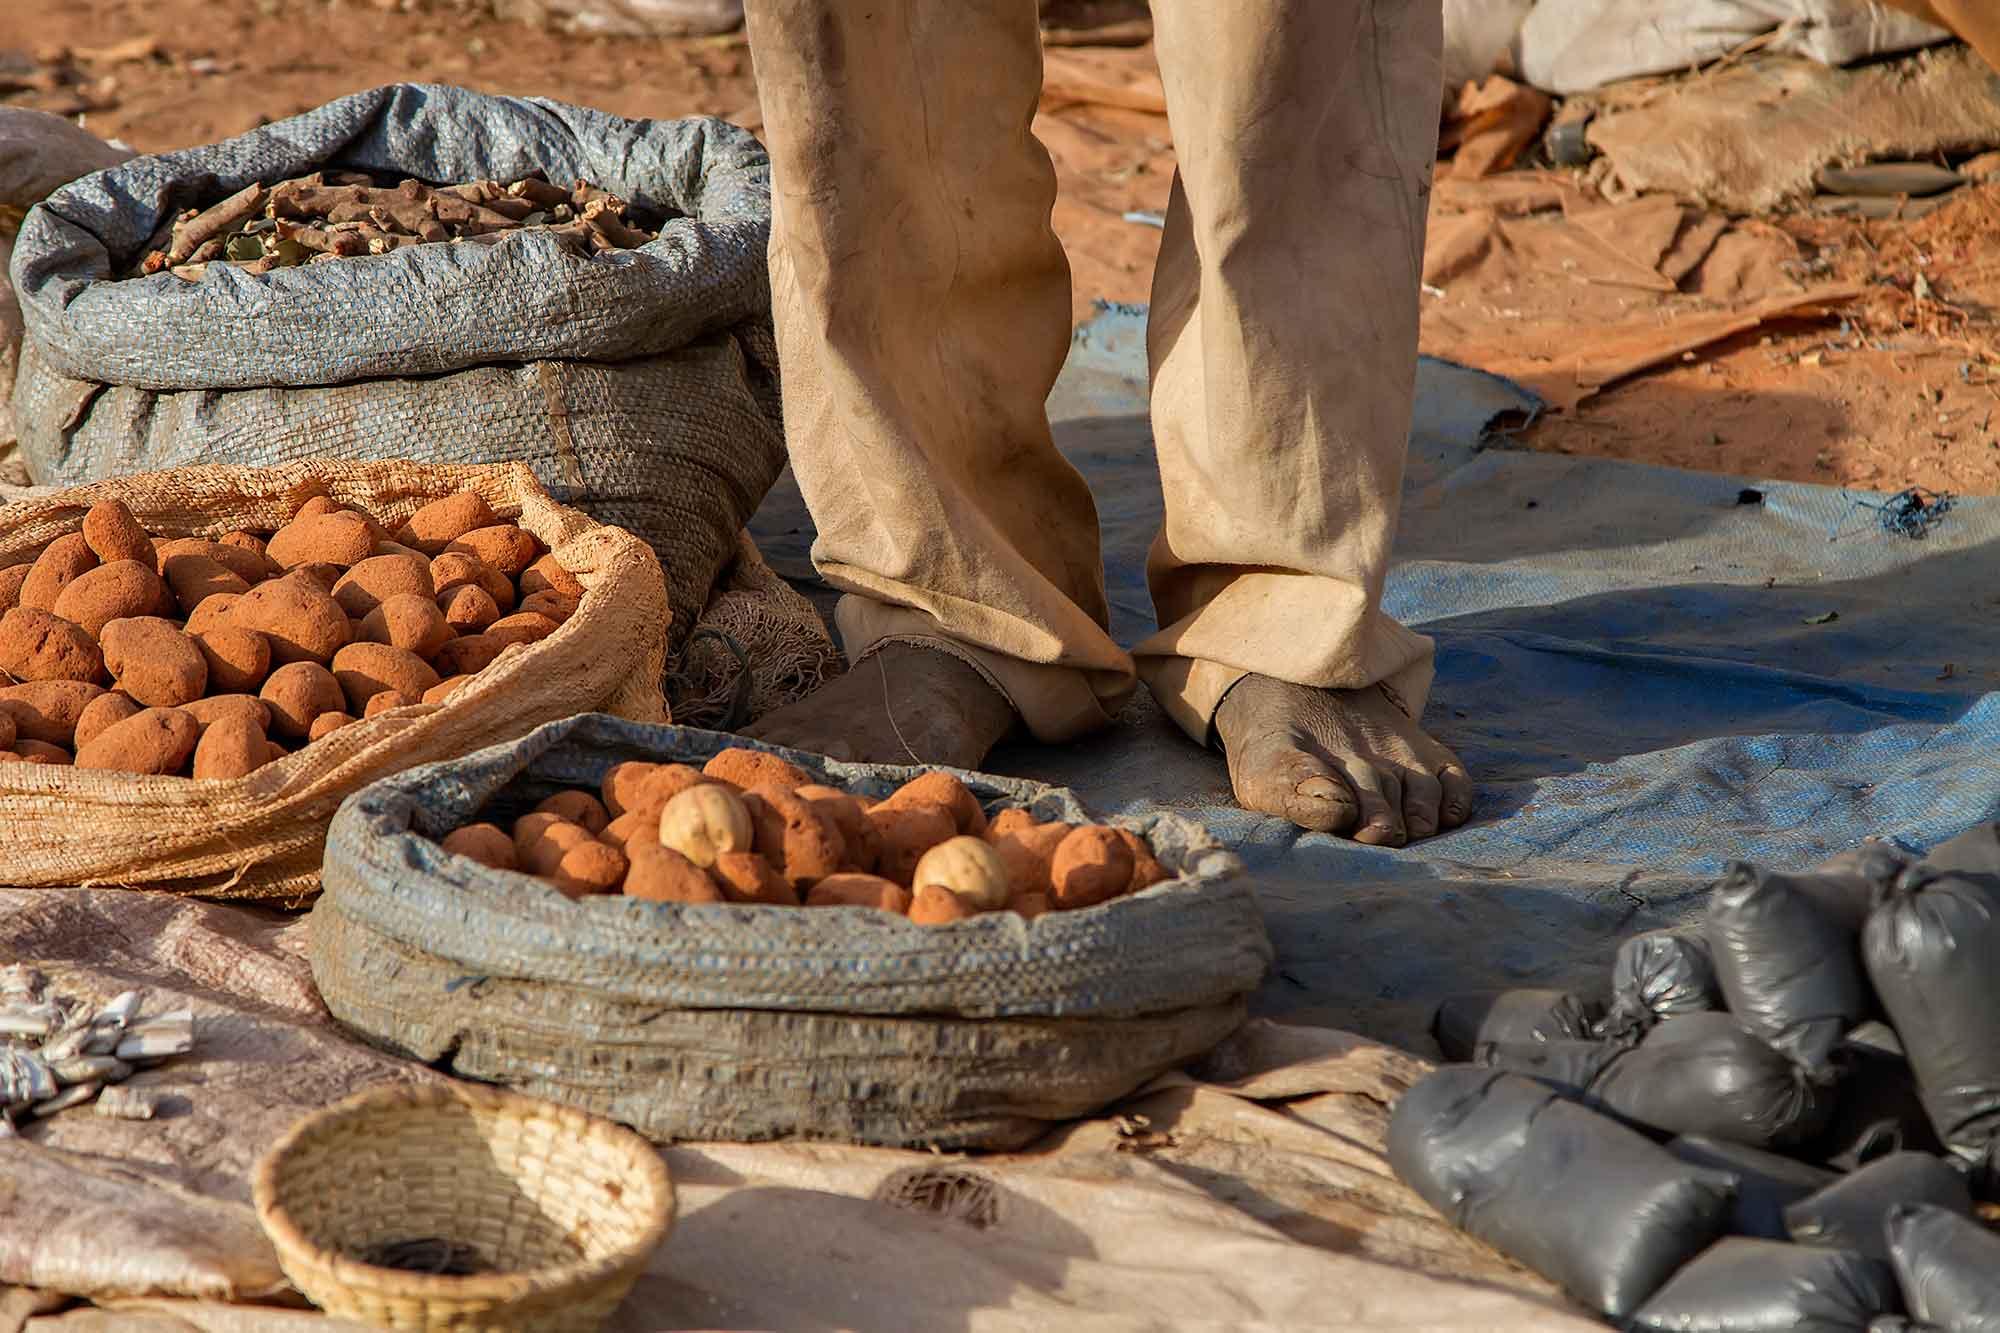 feet-voodeoo-man-banfora-burkina-faso-africa